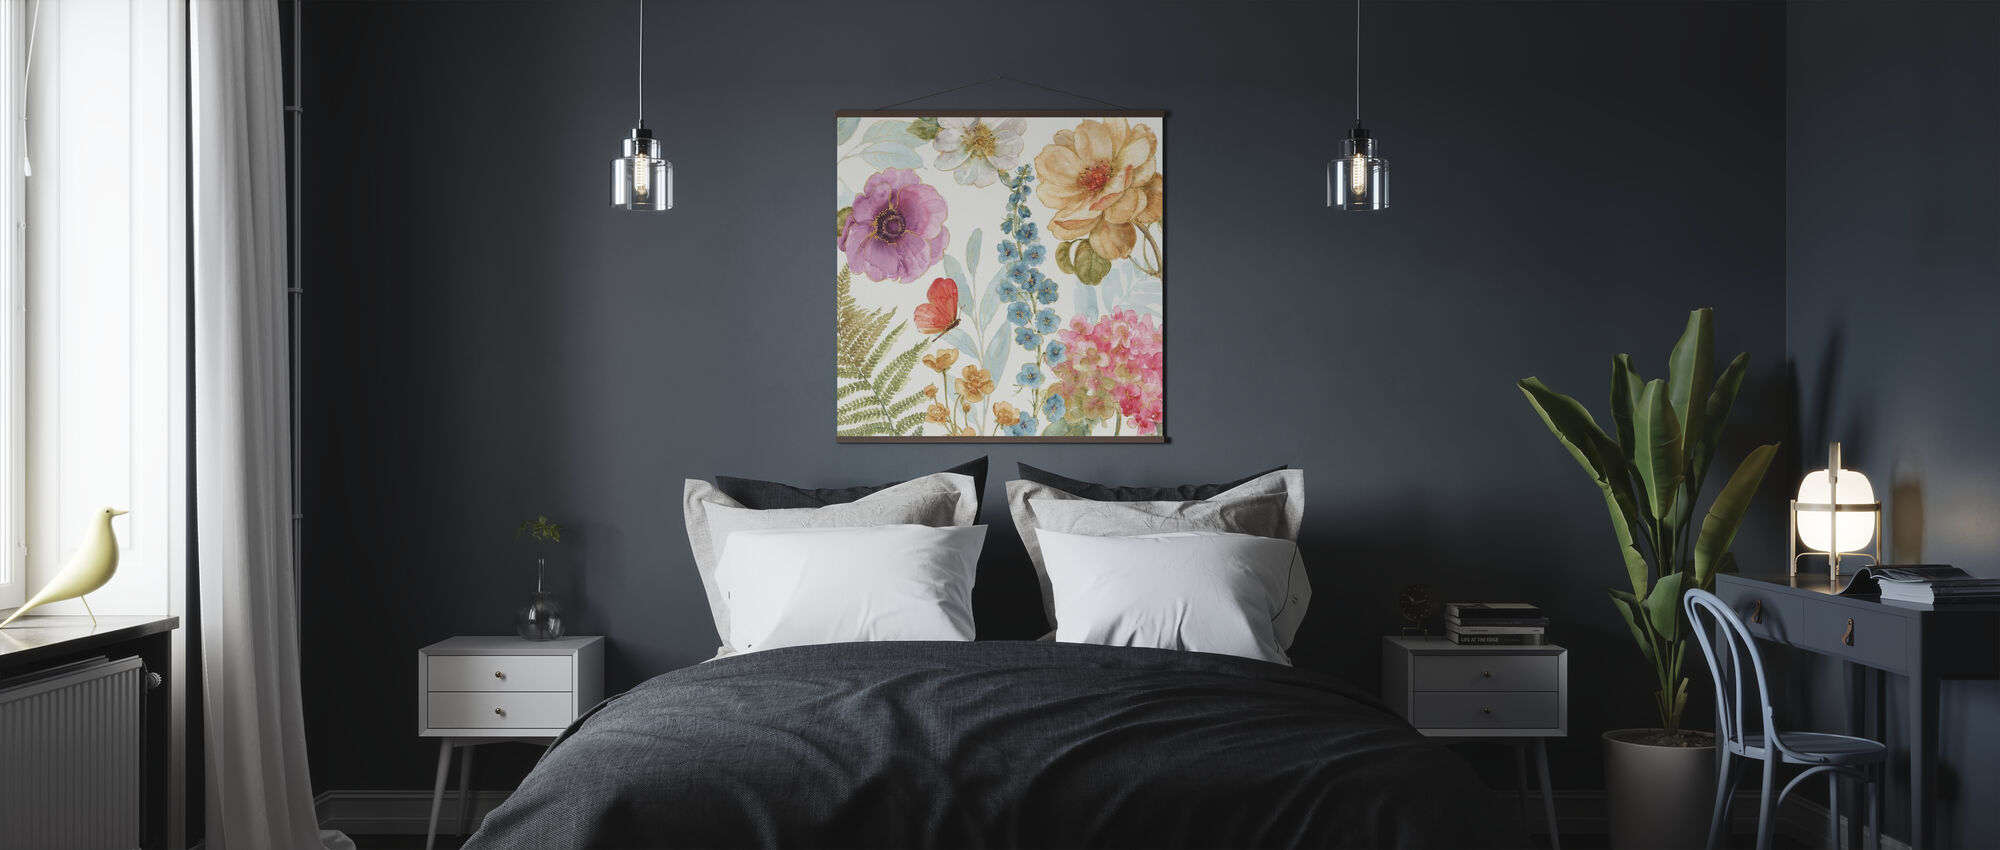 Gartenfreude - Poster - Schlafzimmer